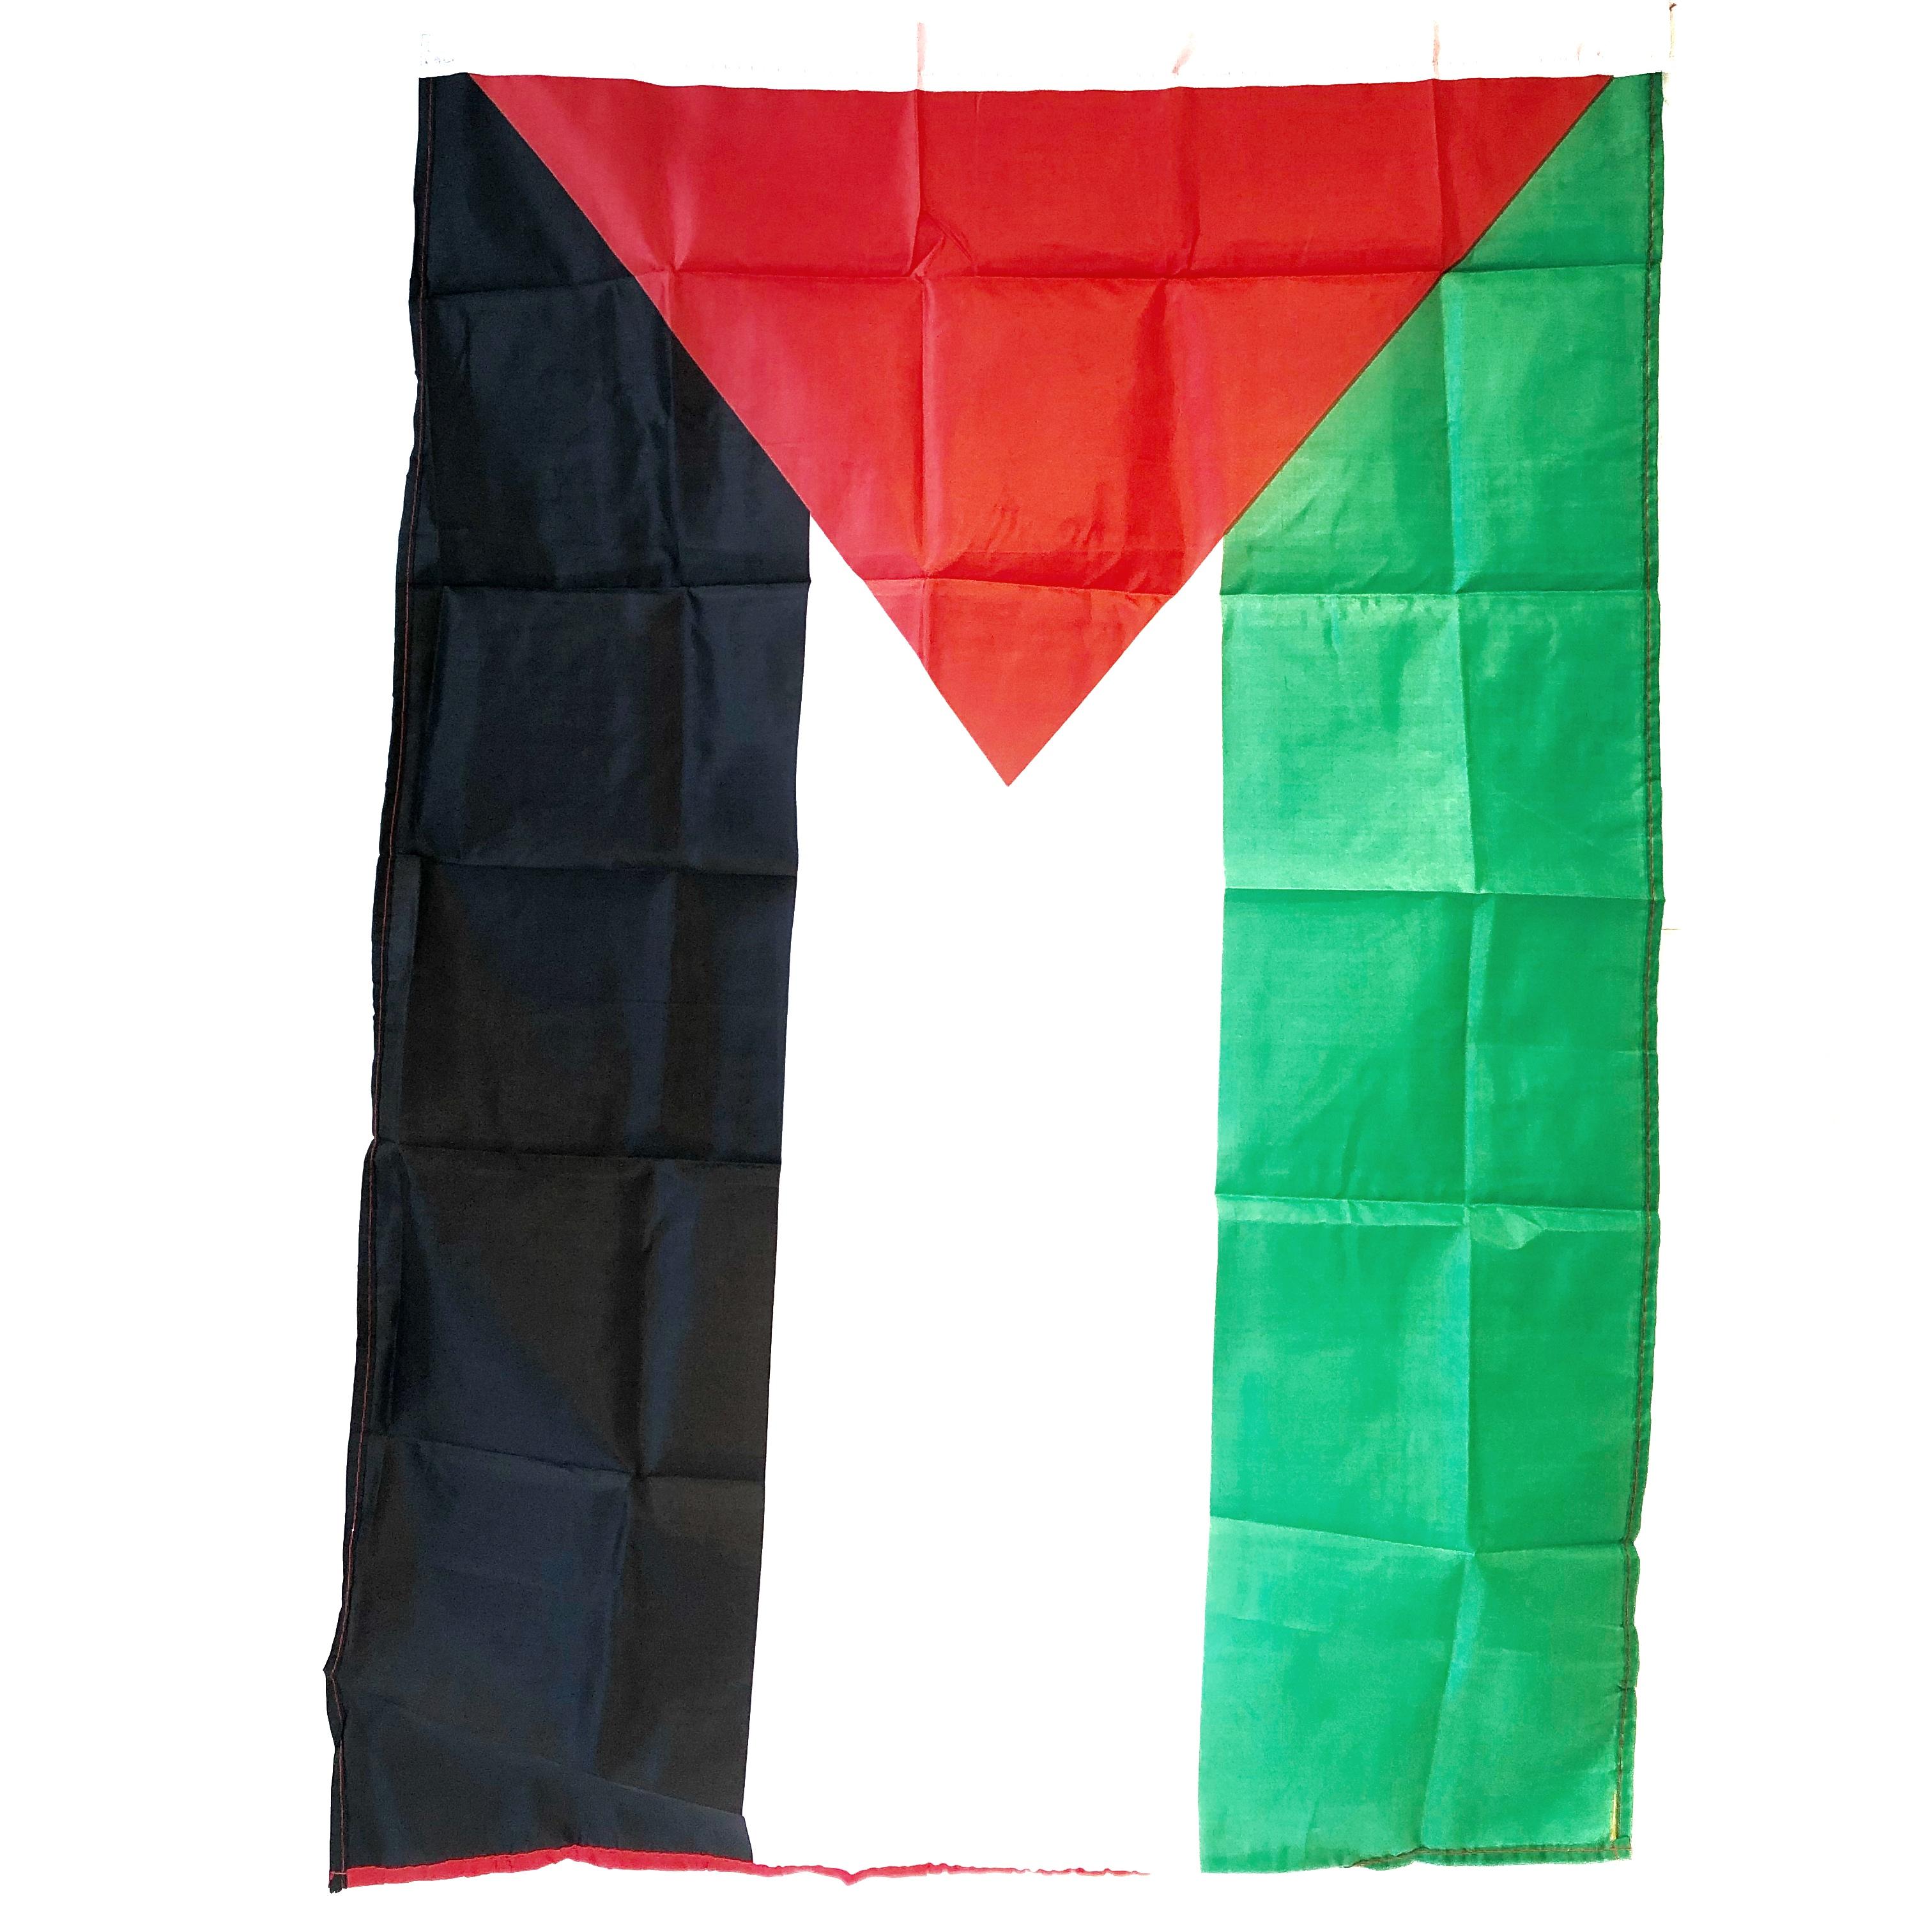 Palestinsk flagg